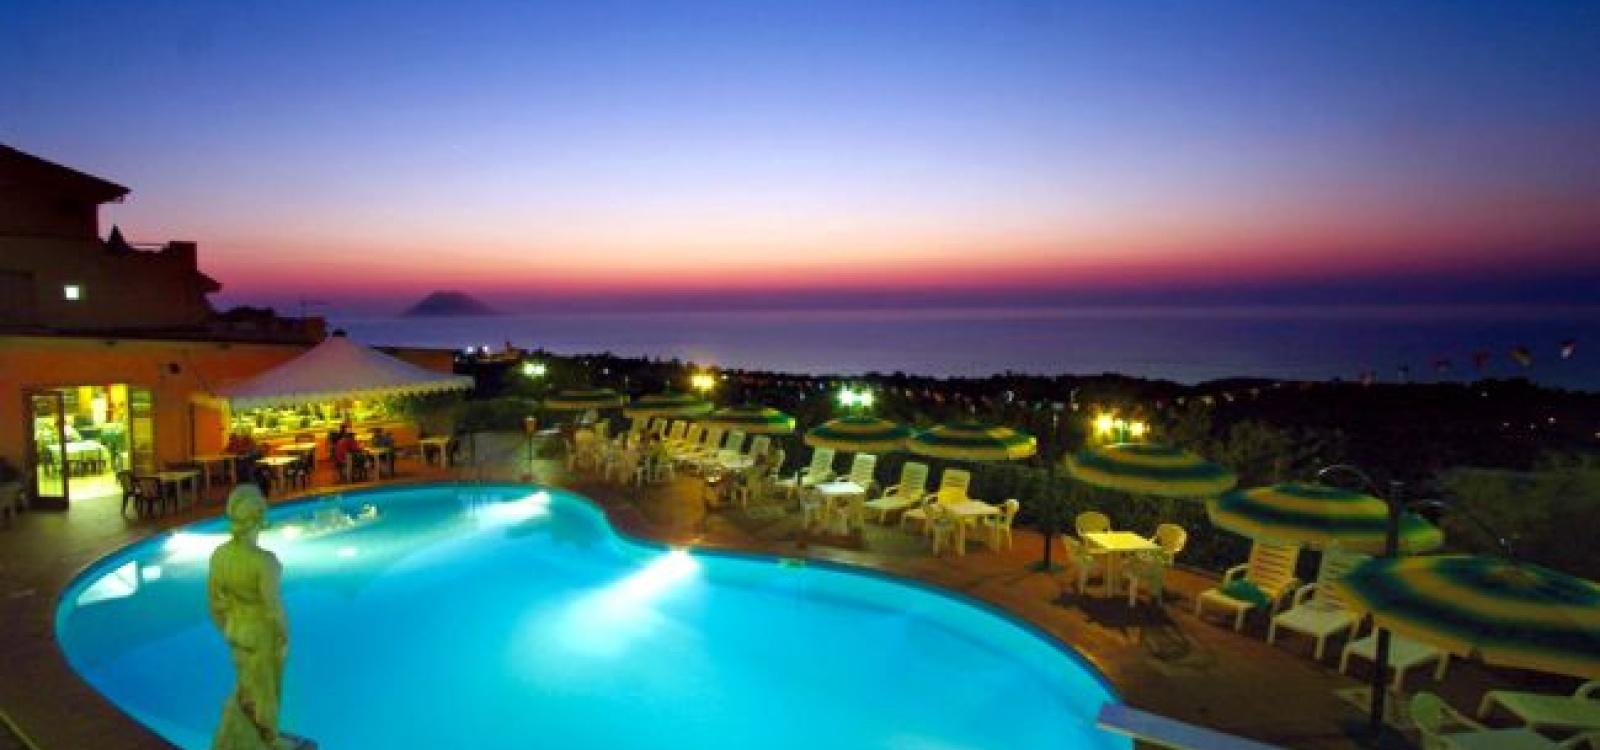 piscina_notte